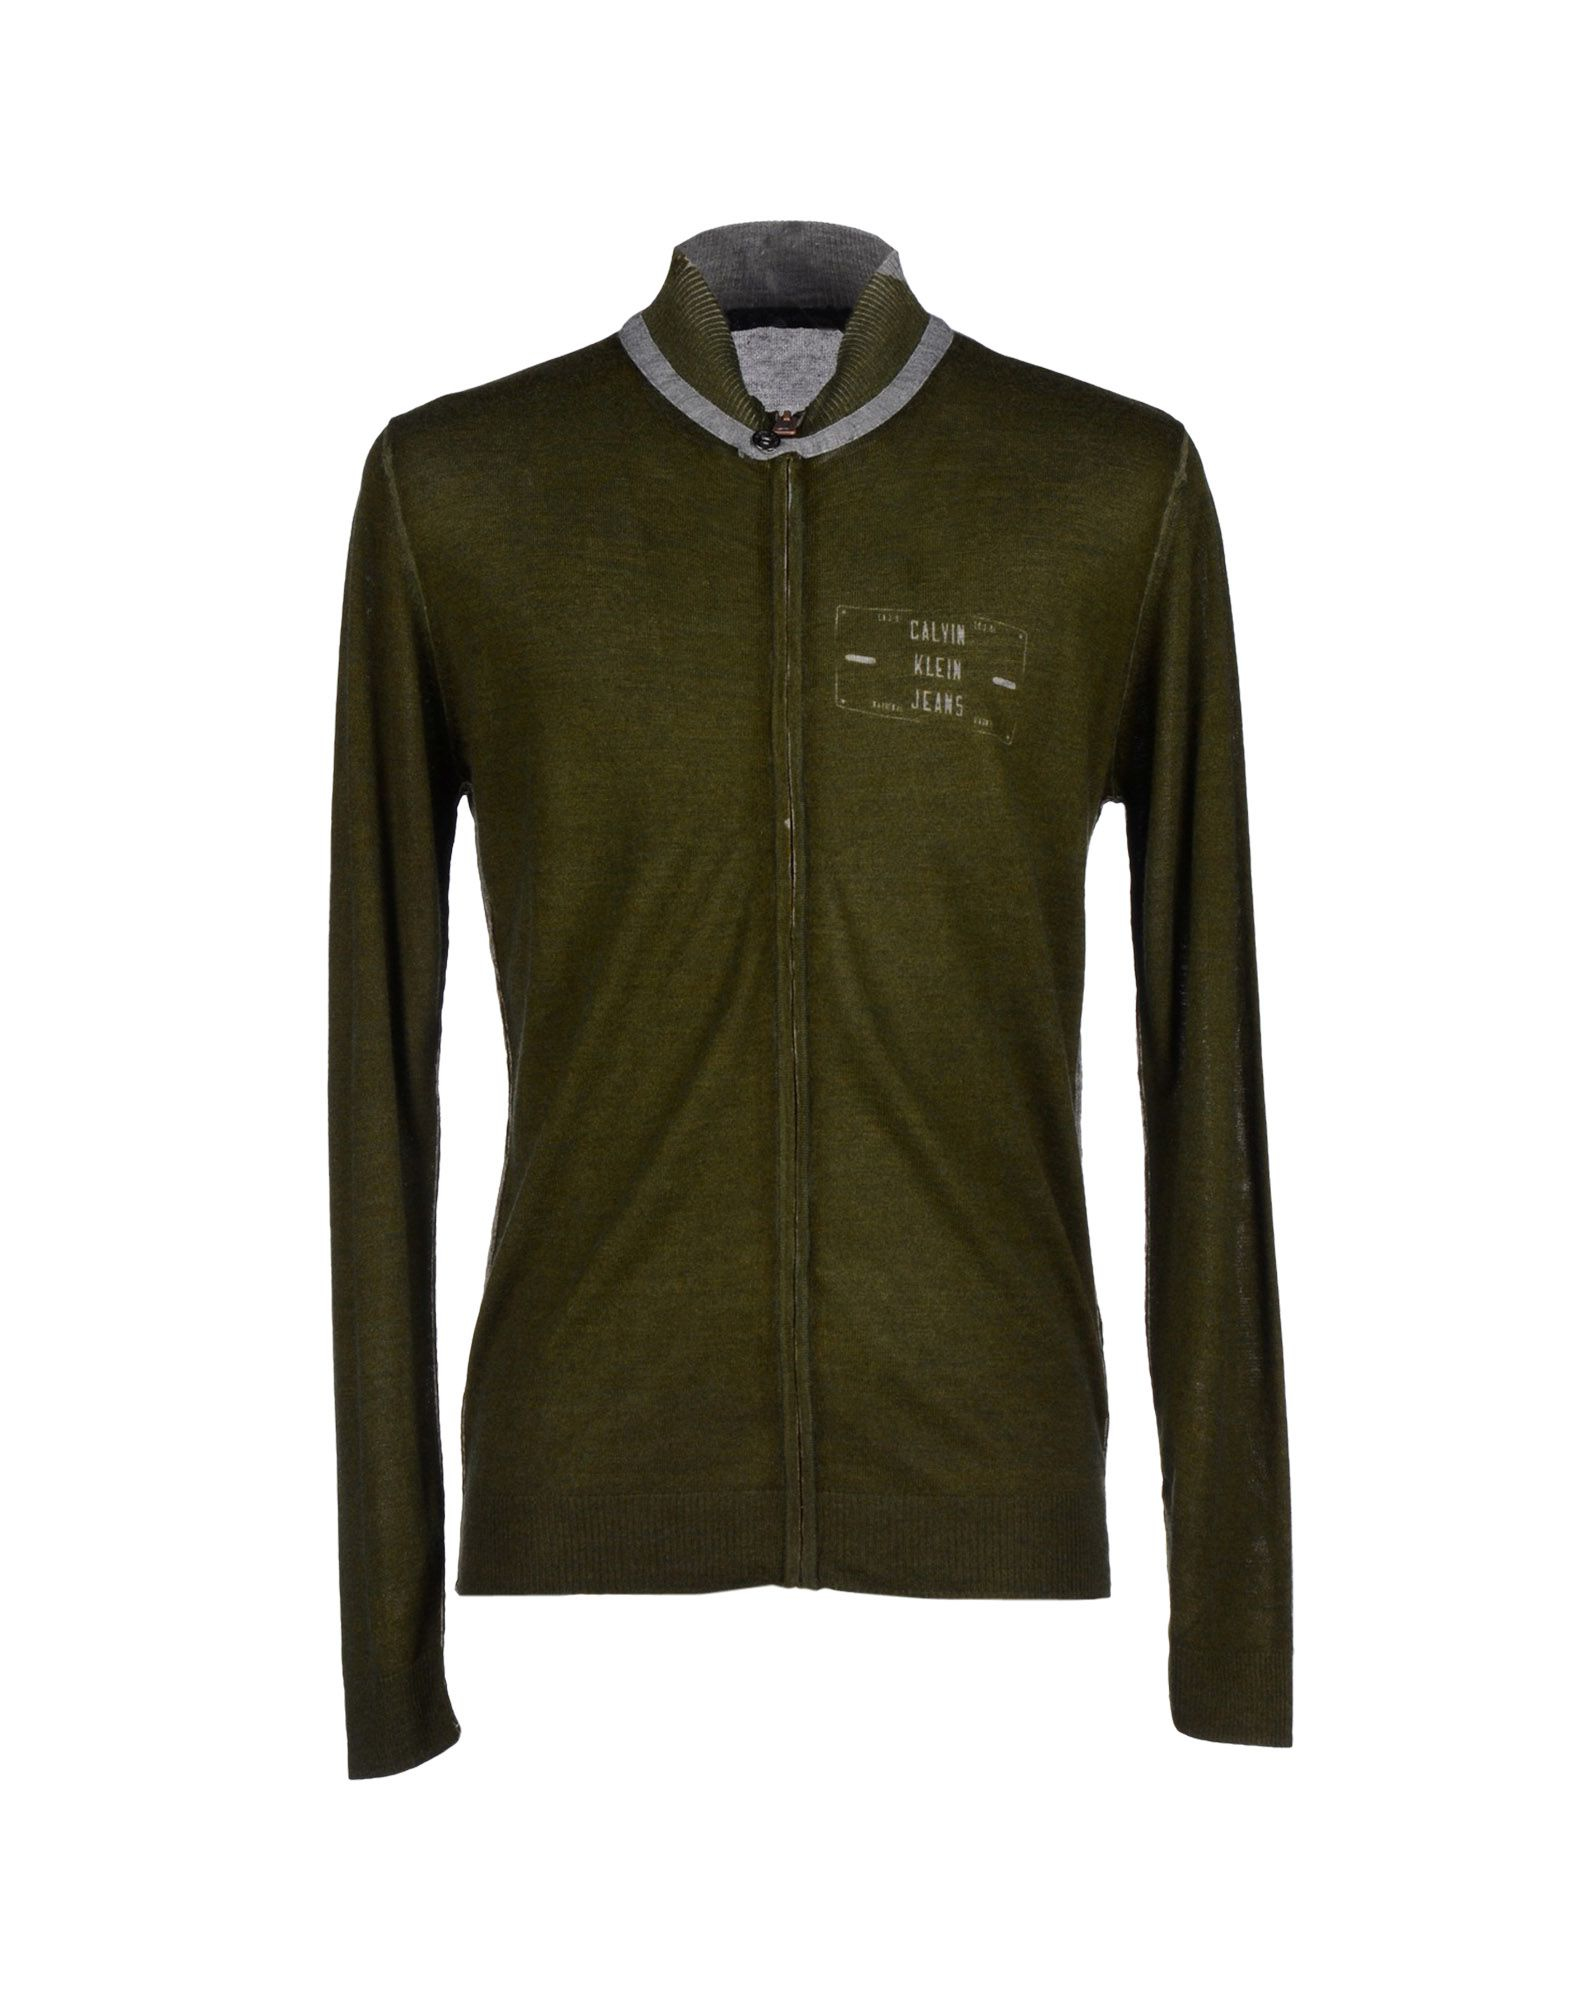 calvin klein sweater jacket long sweater jacket. Black Bedroom Furniture Sets. Home Design Ideas